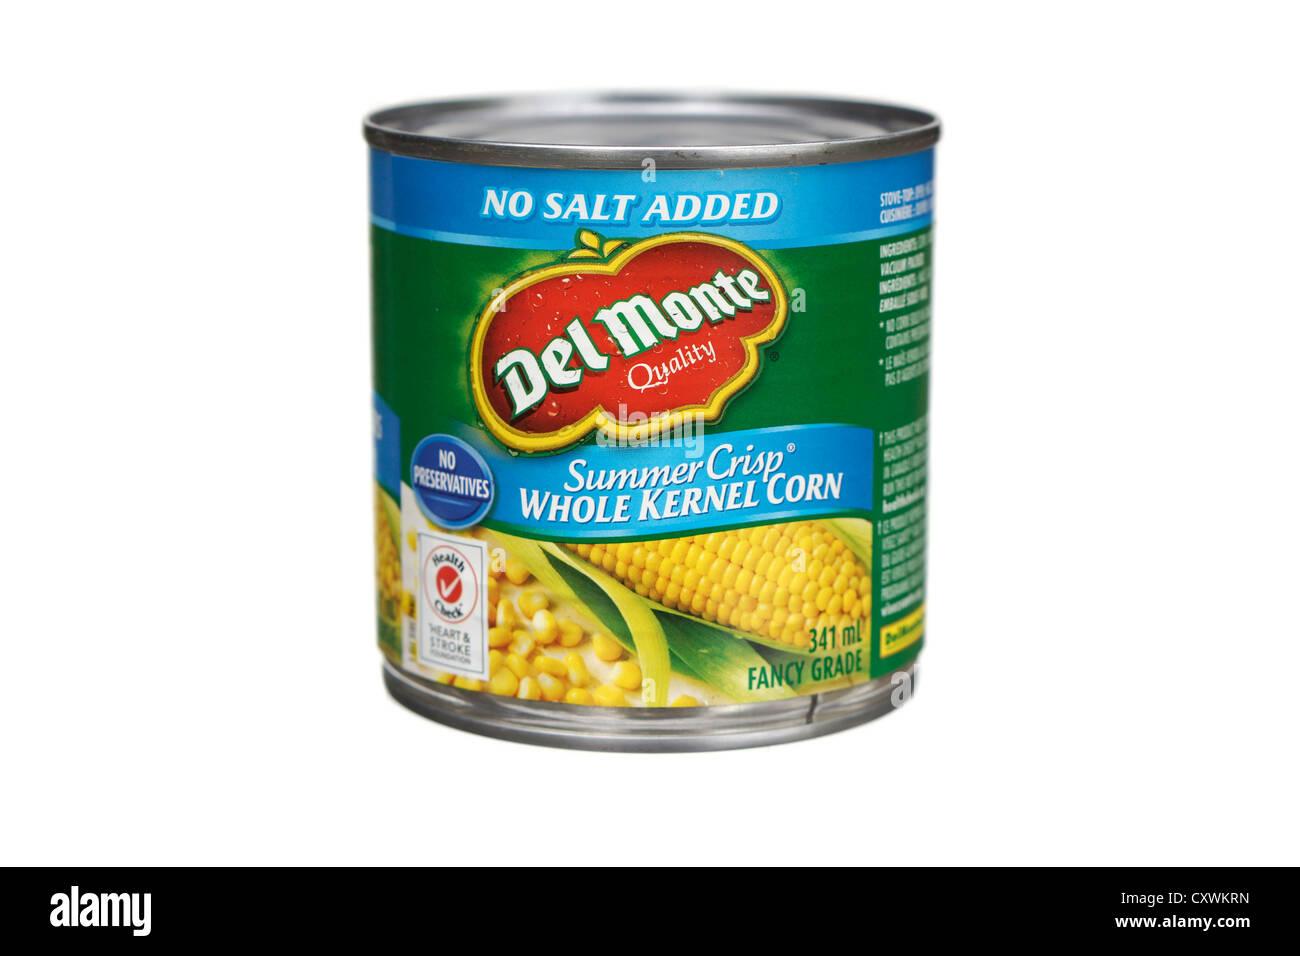 Can of Corn, kernel, kernels, no salt added, low sodium - Stock Image